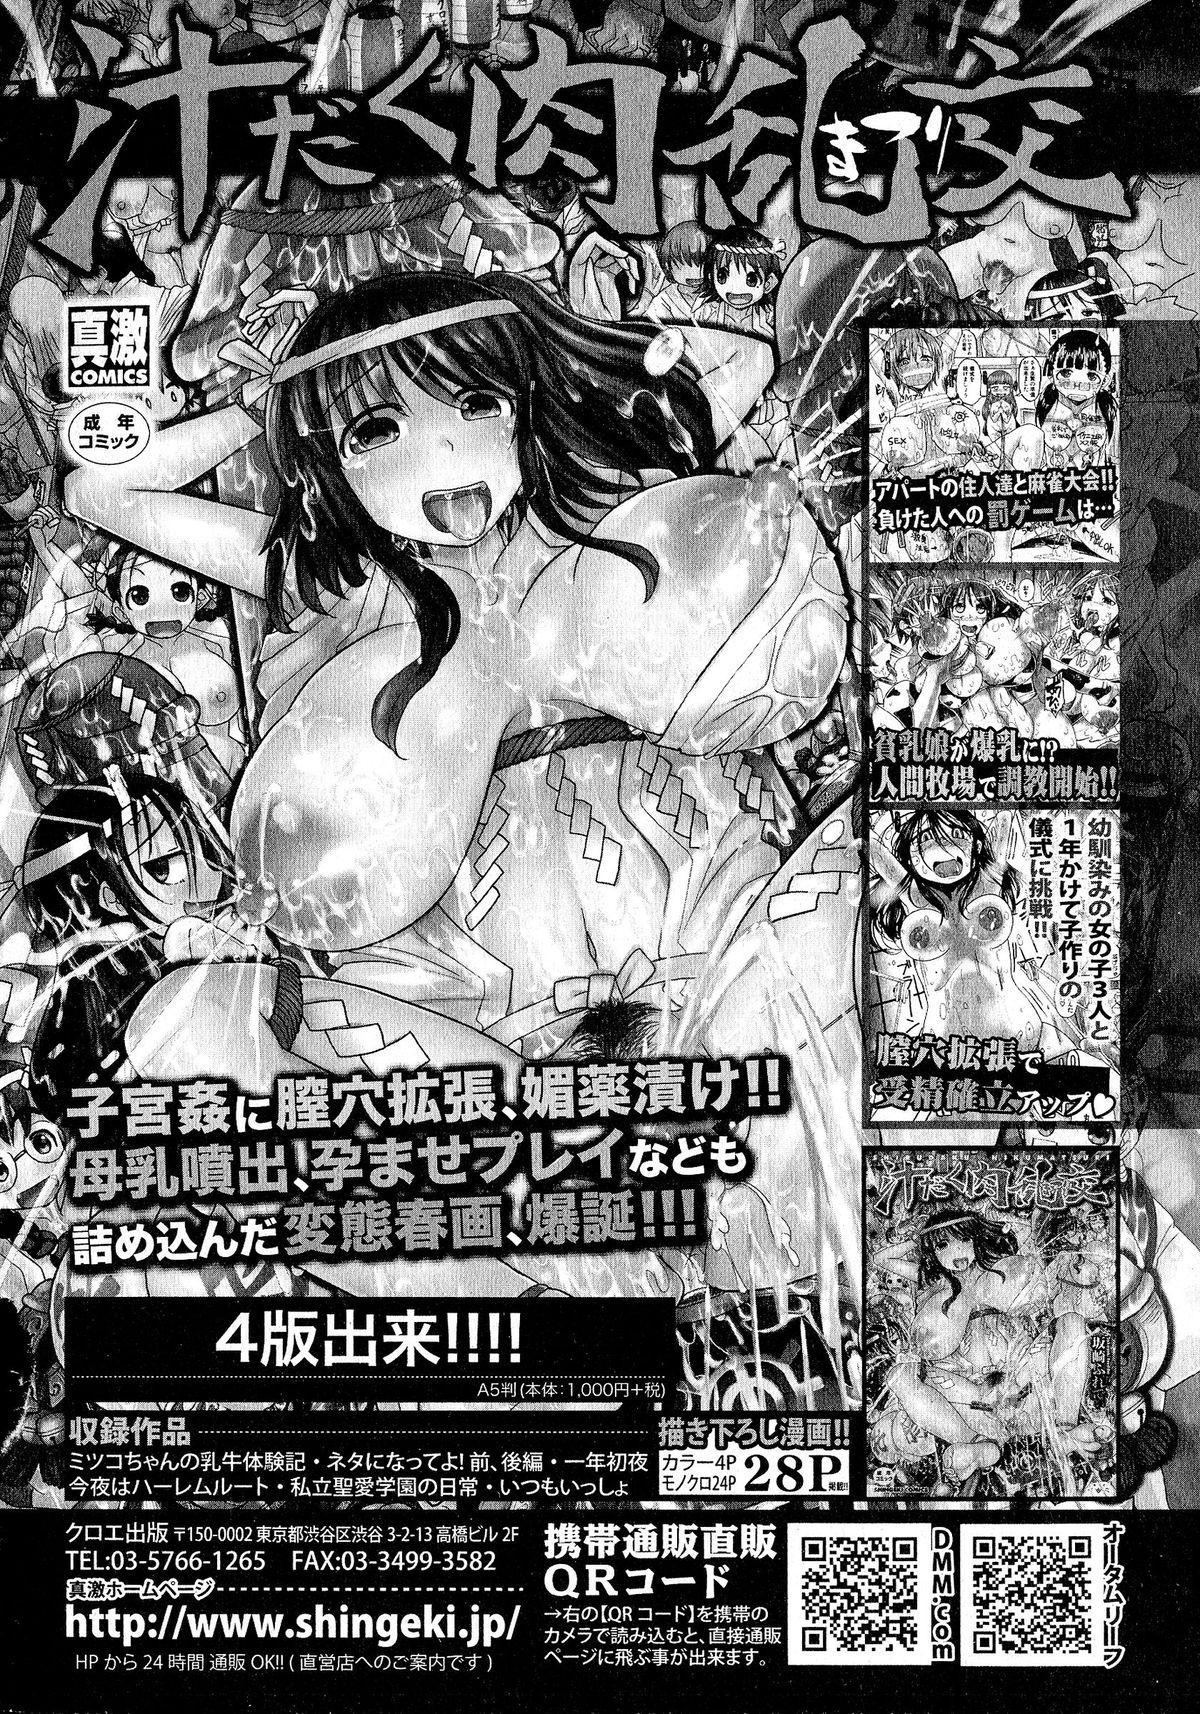 Comic Shingeki 2015-06 194